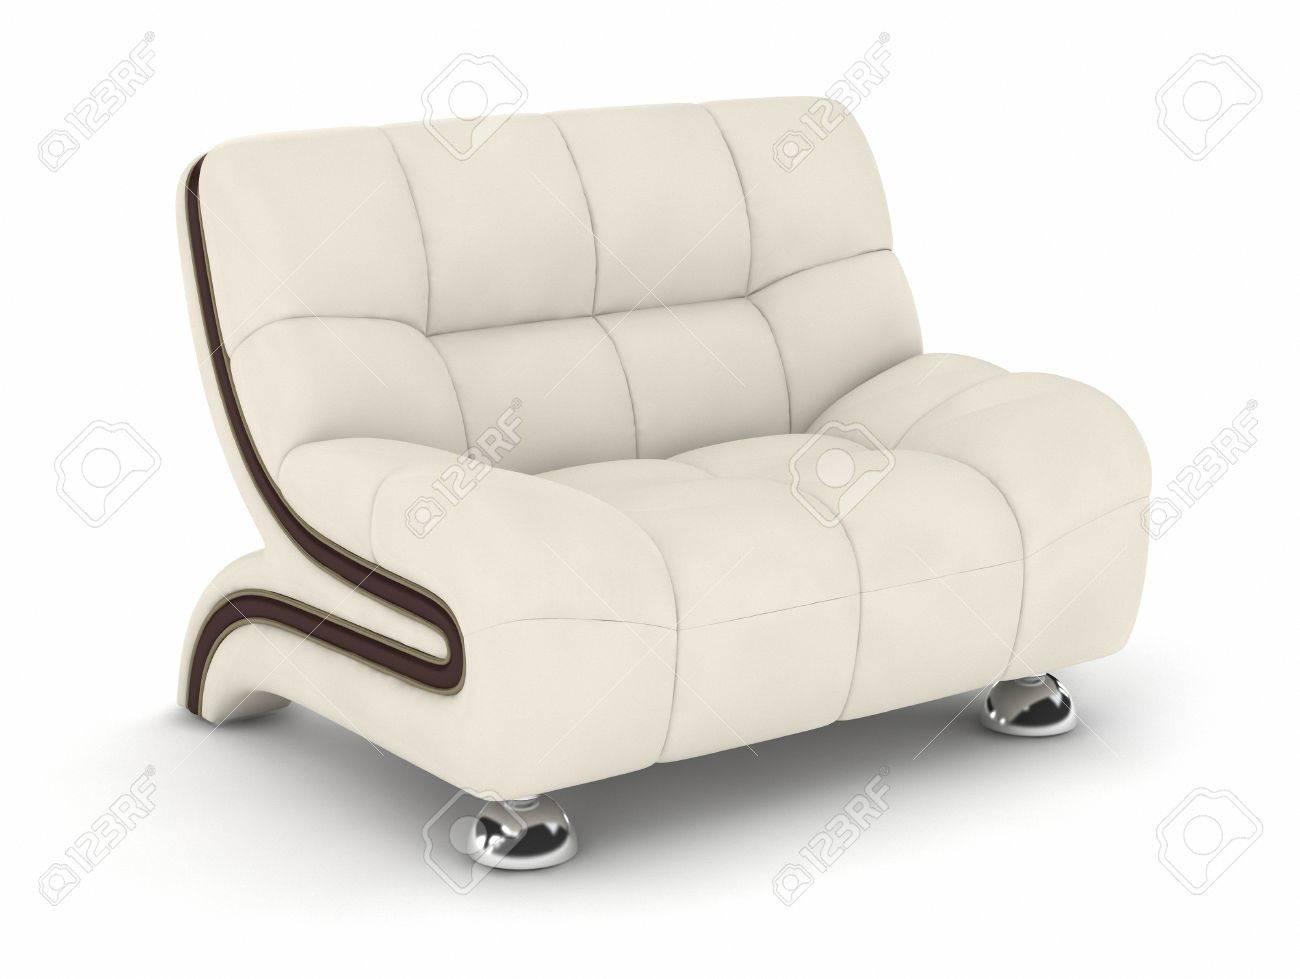 Single Leather Sofa On White Background. Stock Photo   33660742